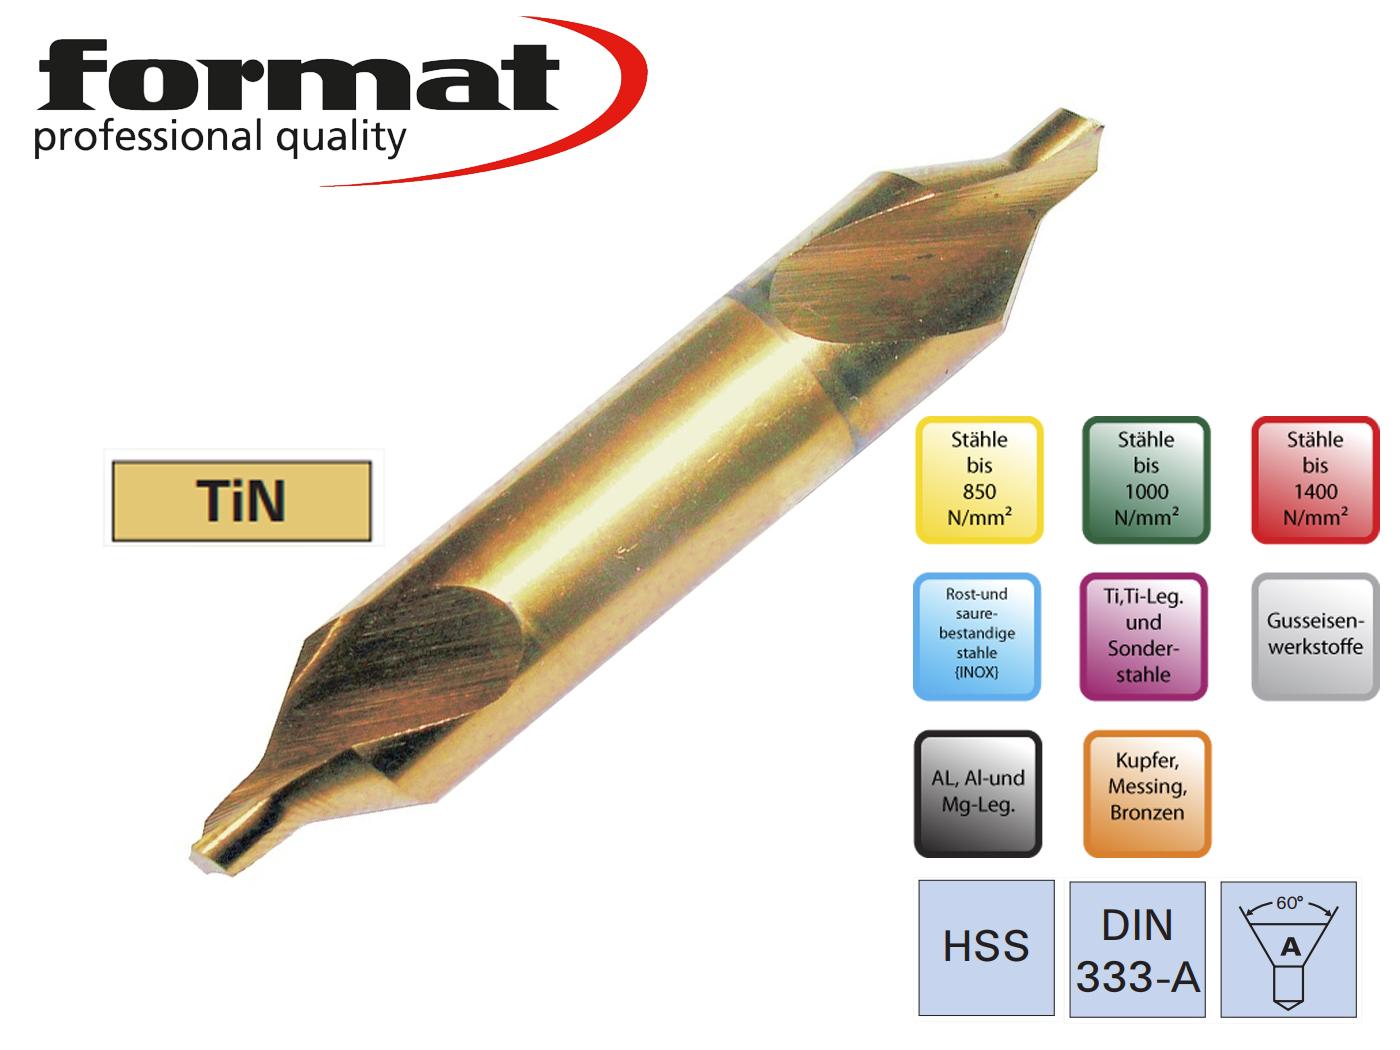 Centreerboren DIN 333 A HSS TiN FORMAT   DKMTools - DKM Tools